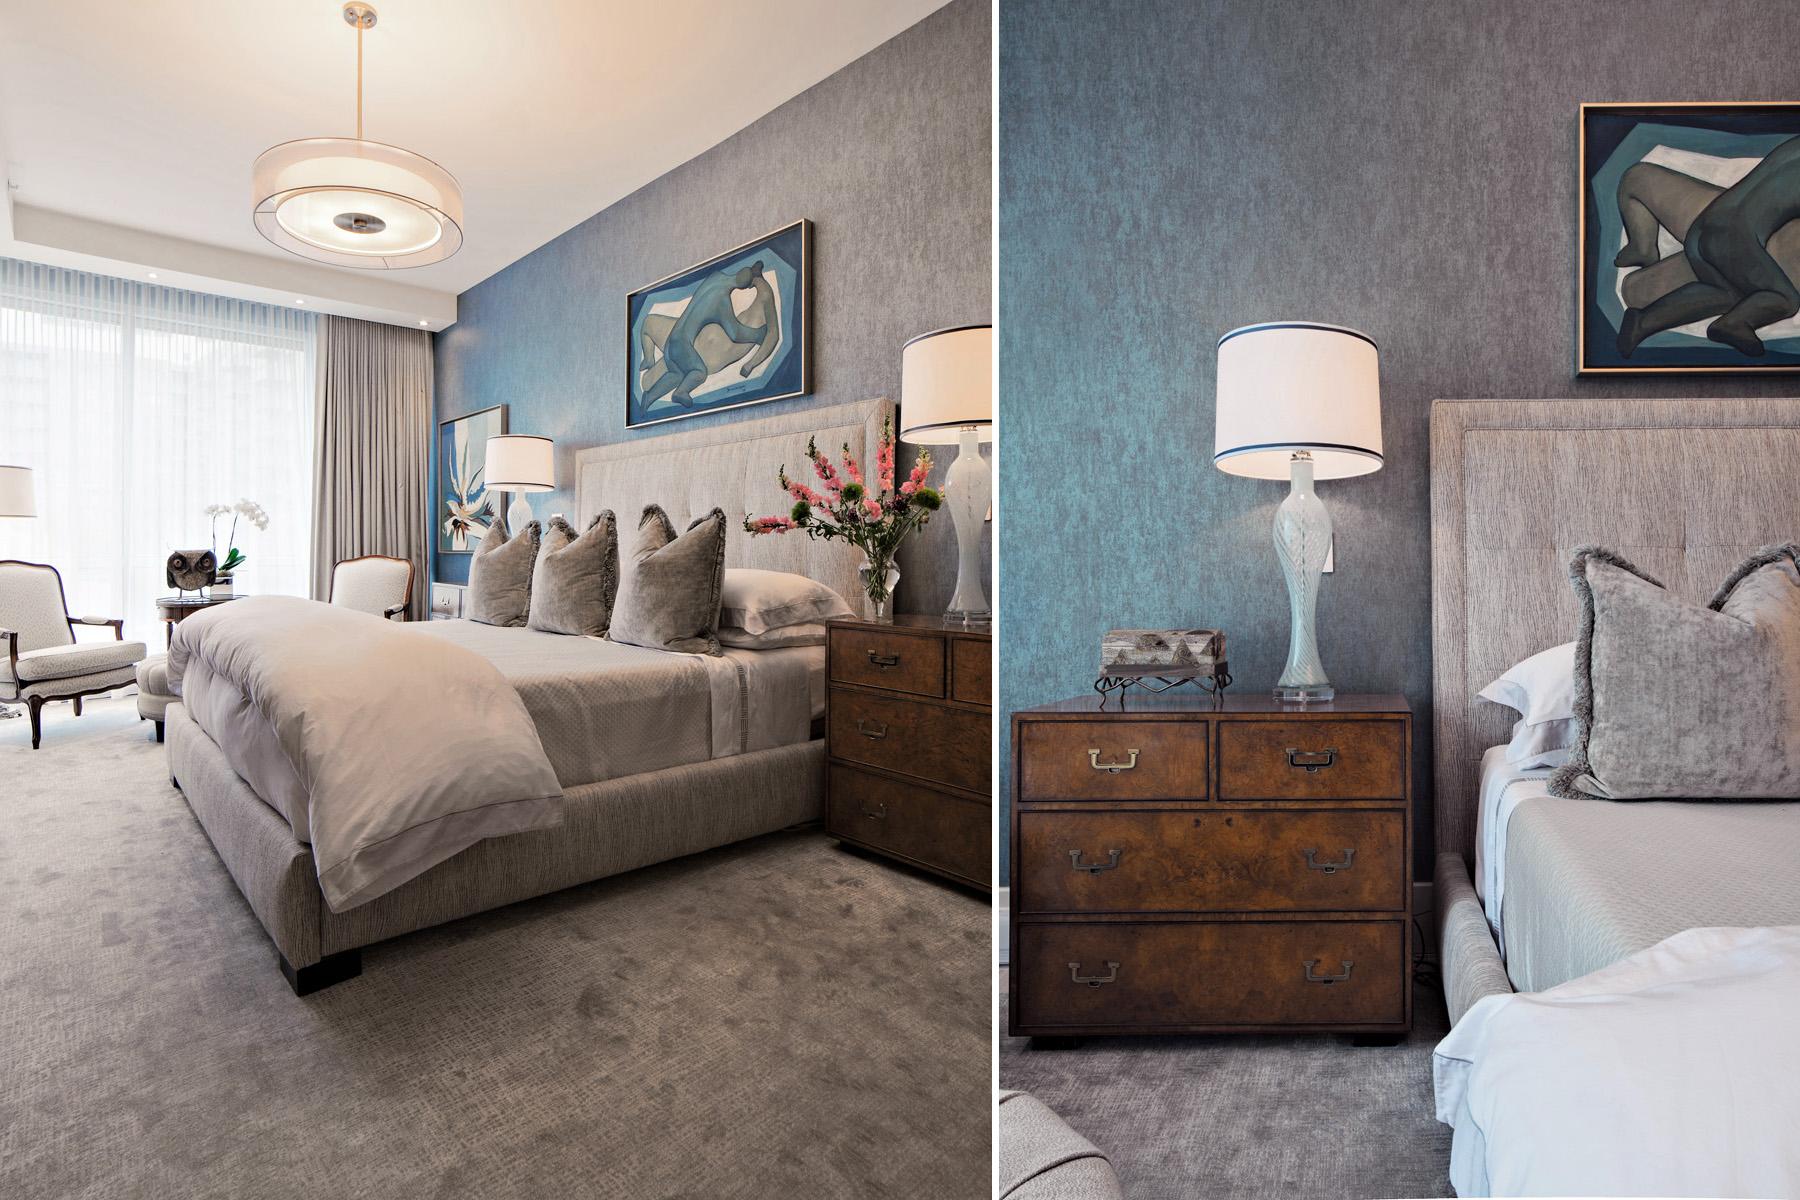 interiors-photography-westmount-condo-Jeffrey-Lamb-006